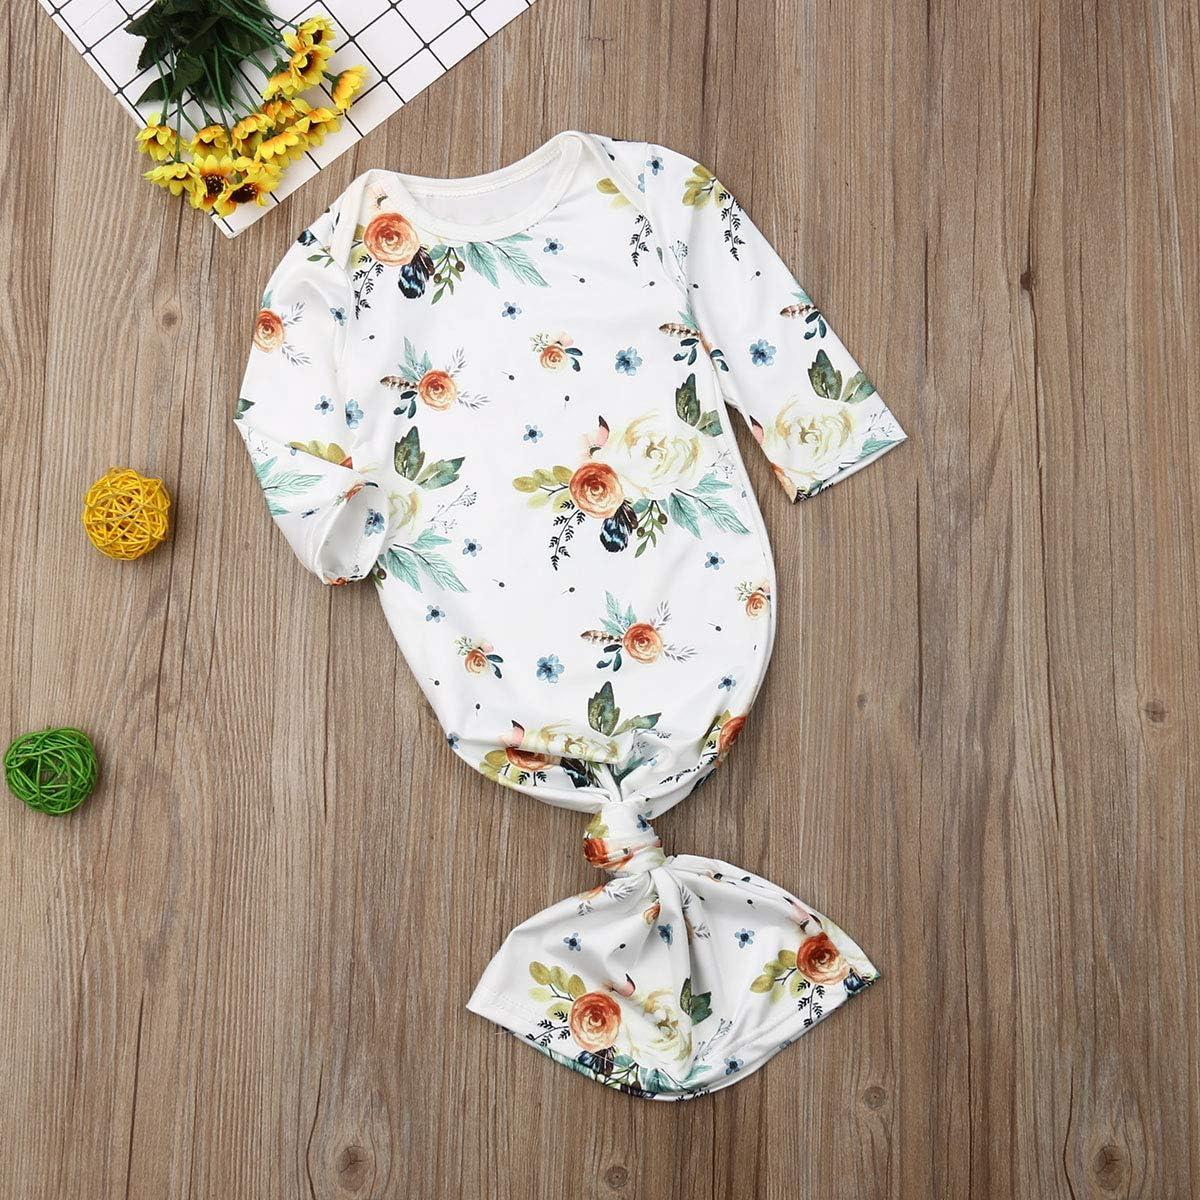 FAROOT Newborn Baby Boy Girls Swaddle Wrap Blanket Nightgown Gown Set Take Home Outfit Sleeping Bag Romper+Headband